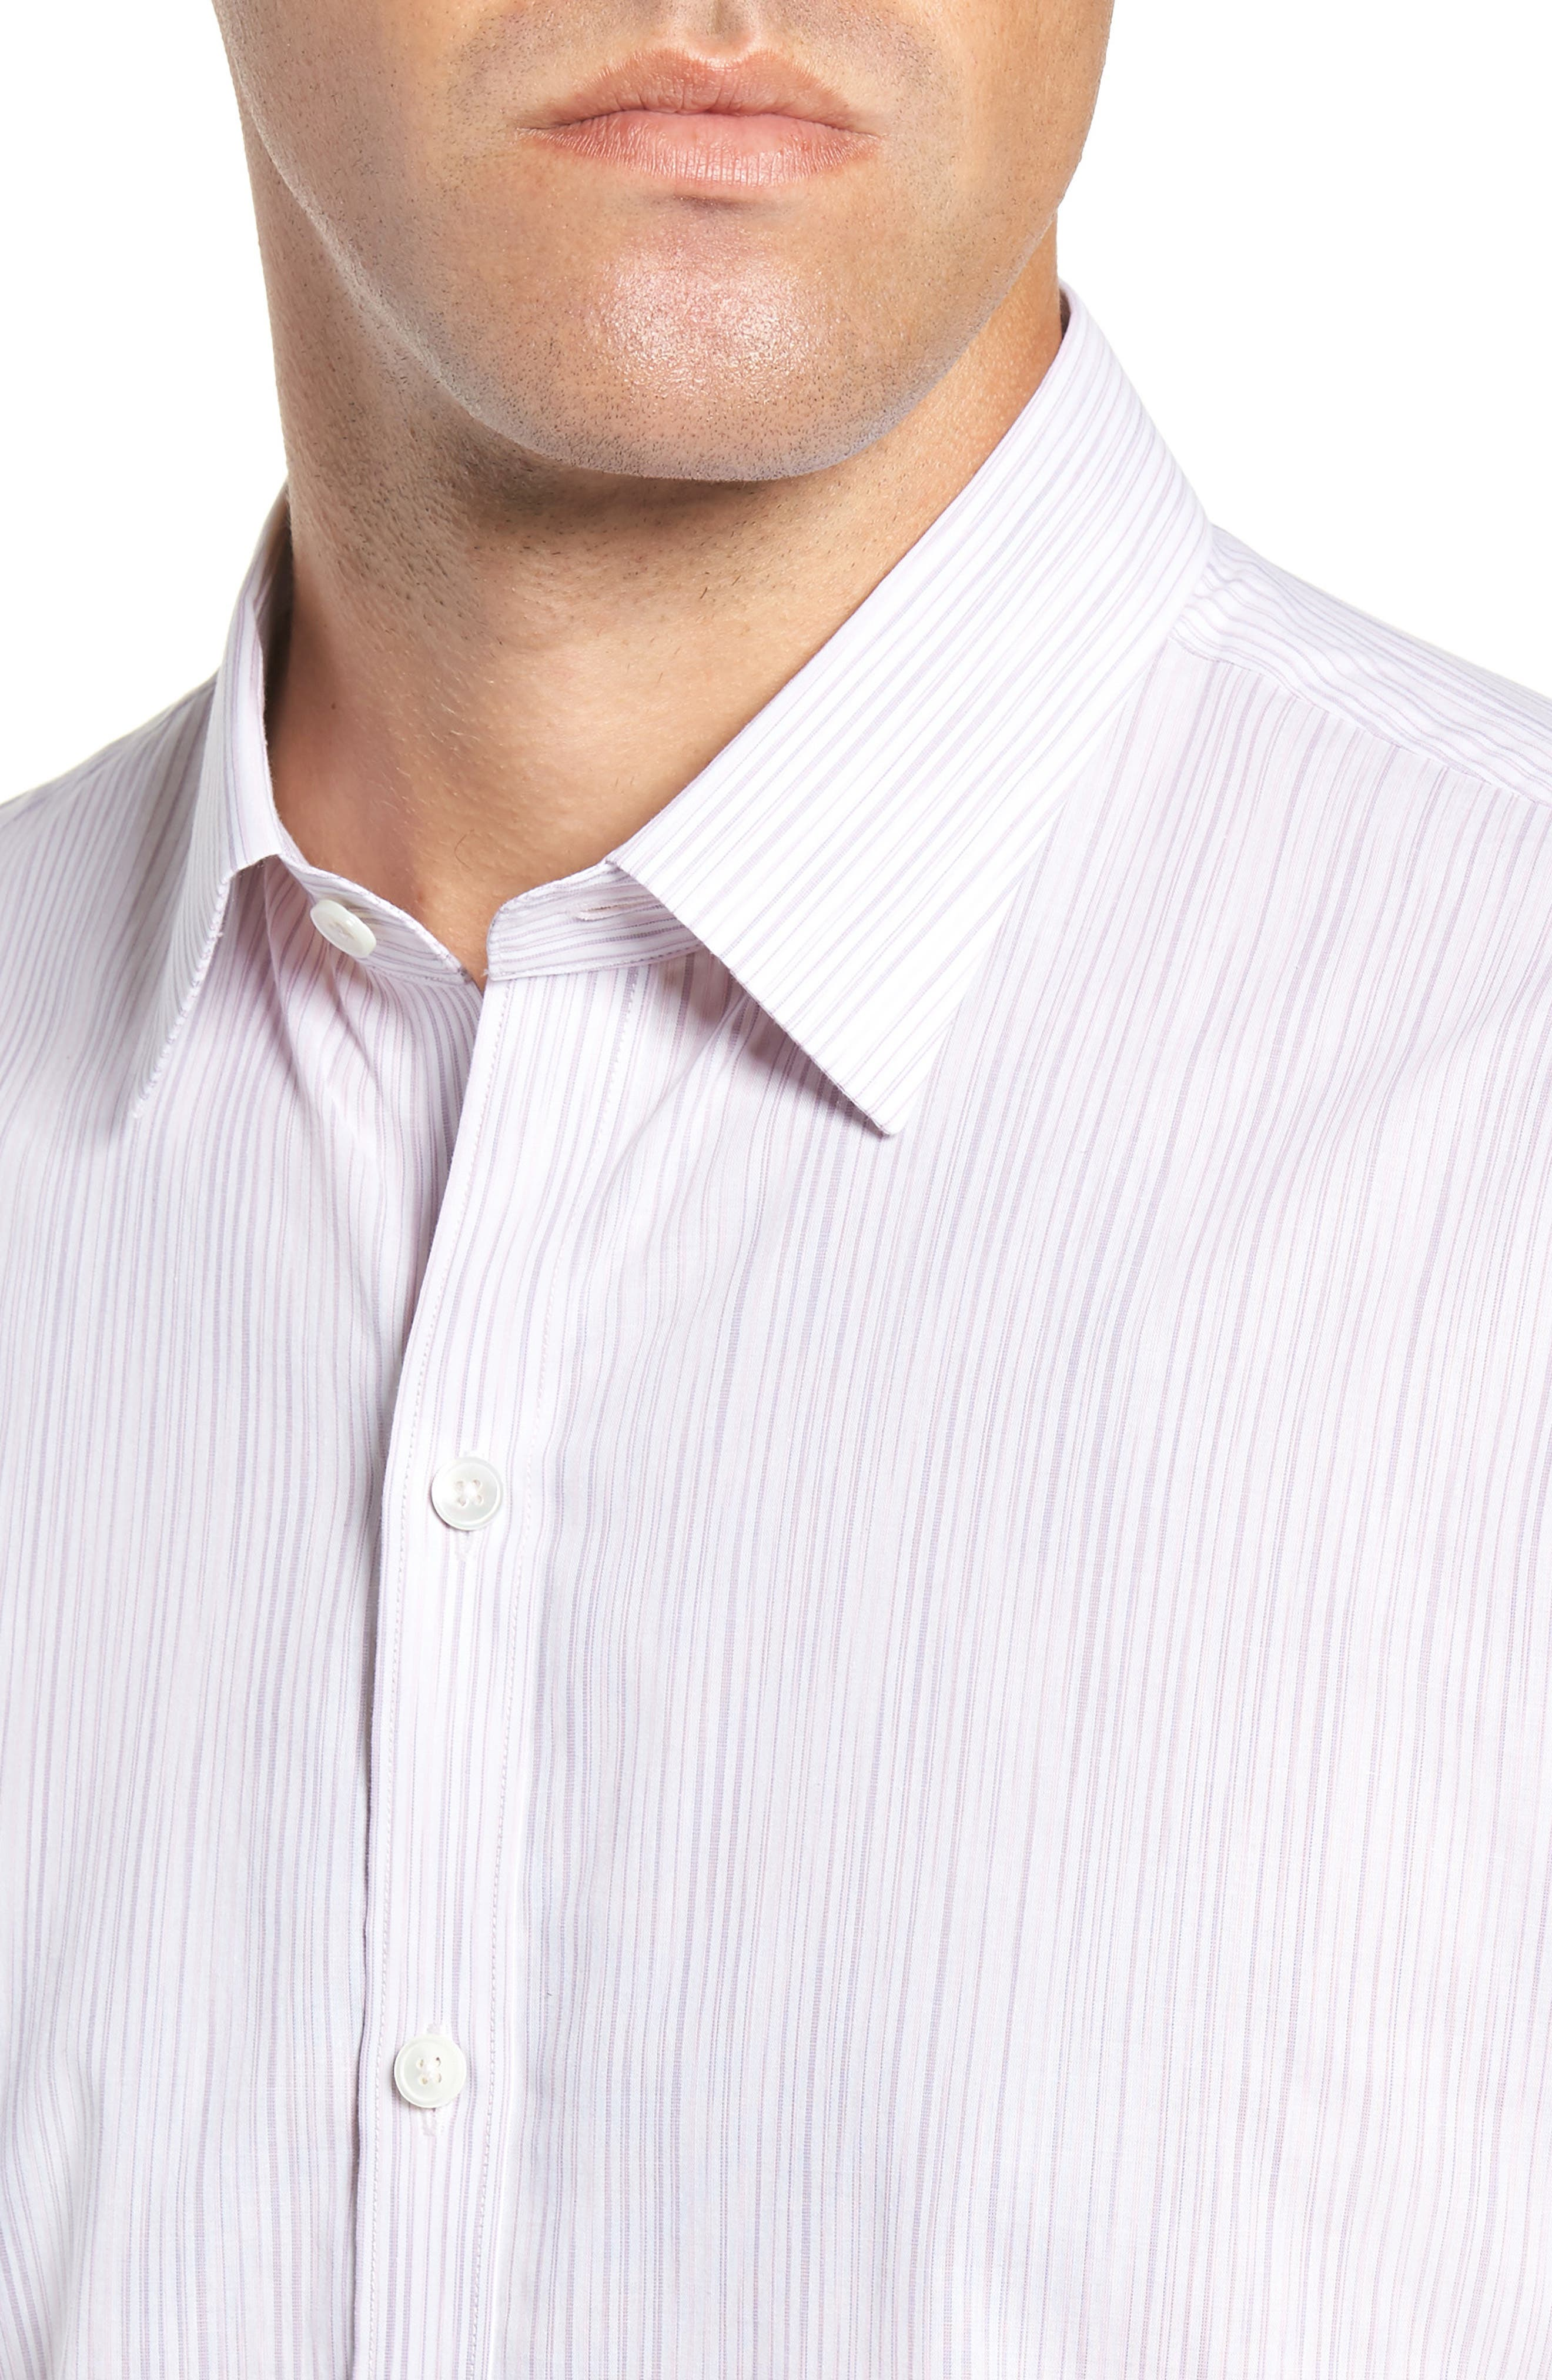 Bella Regular Fit Sport Shirt,                             Alternate thumbnail 2, color,                             LIGHT PINK